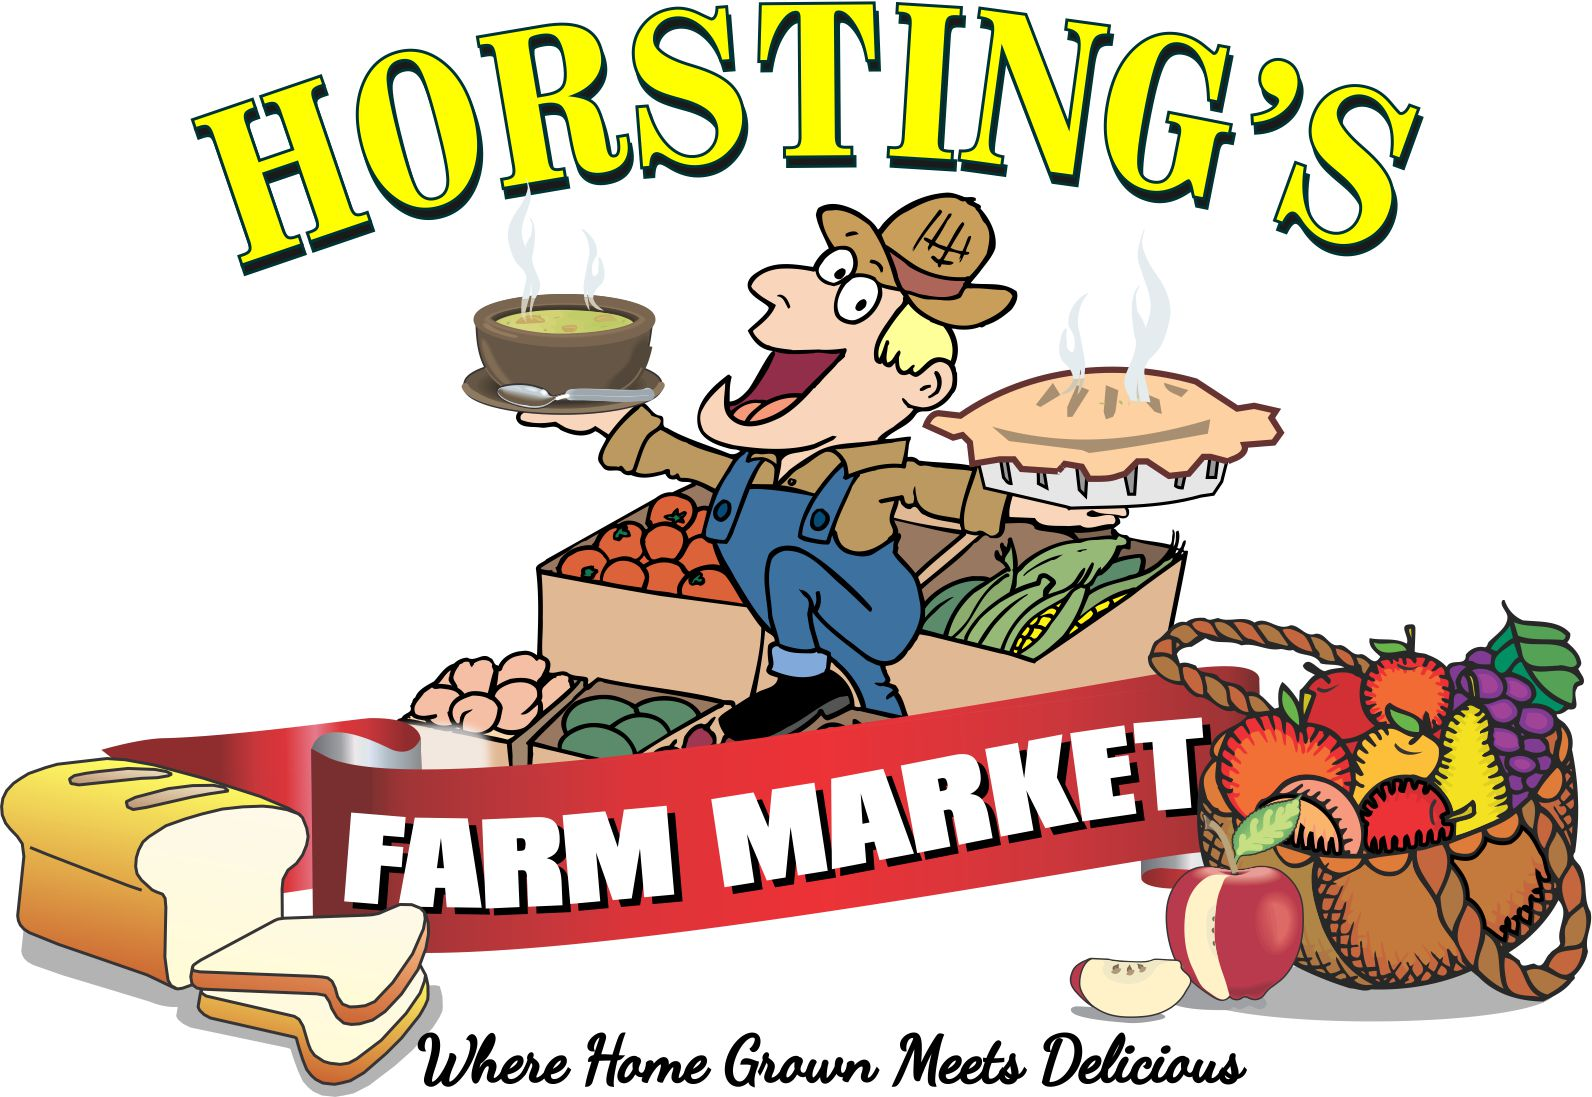 Horsting Farm Market logo.